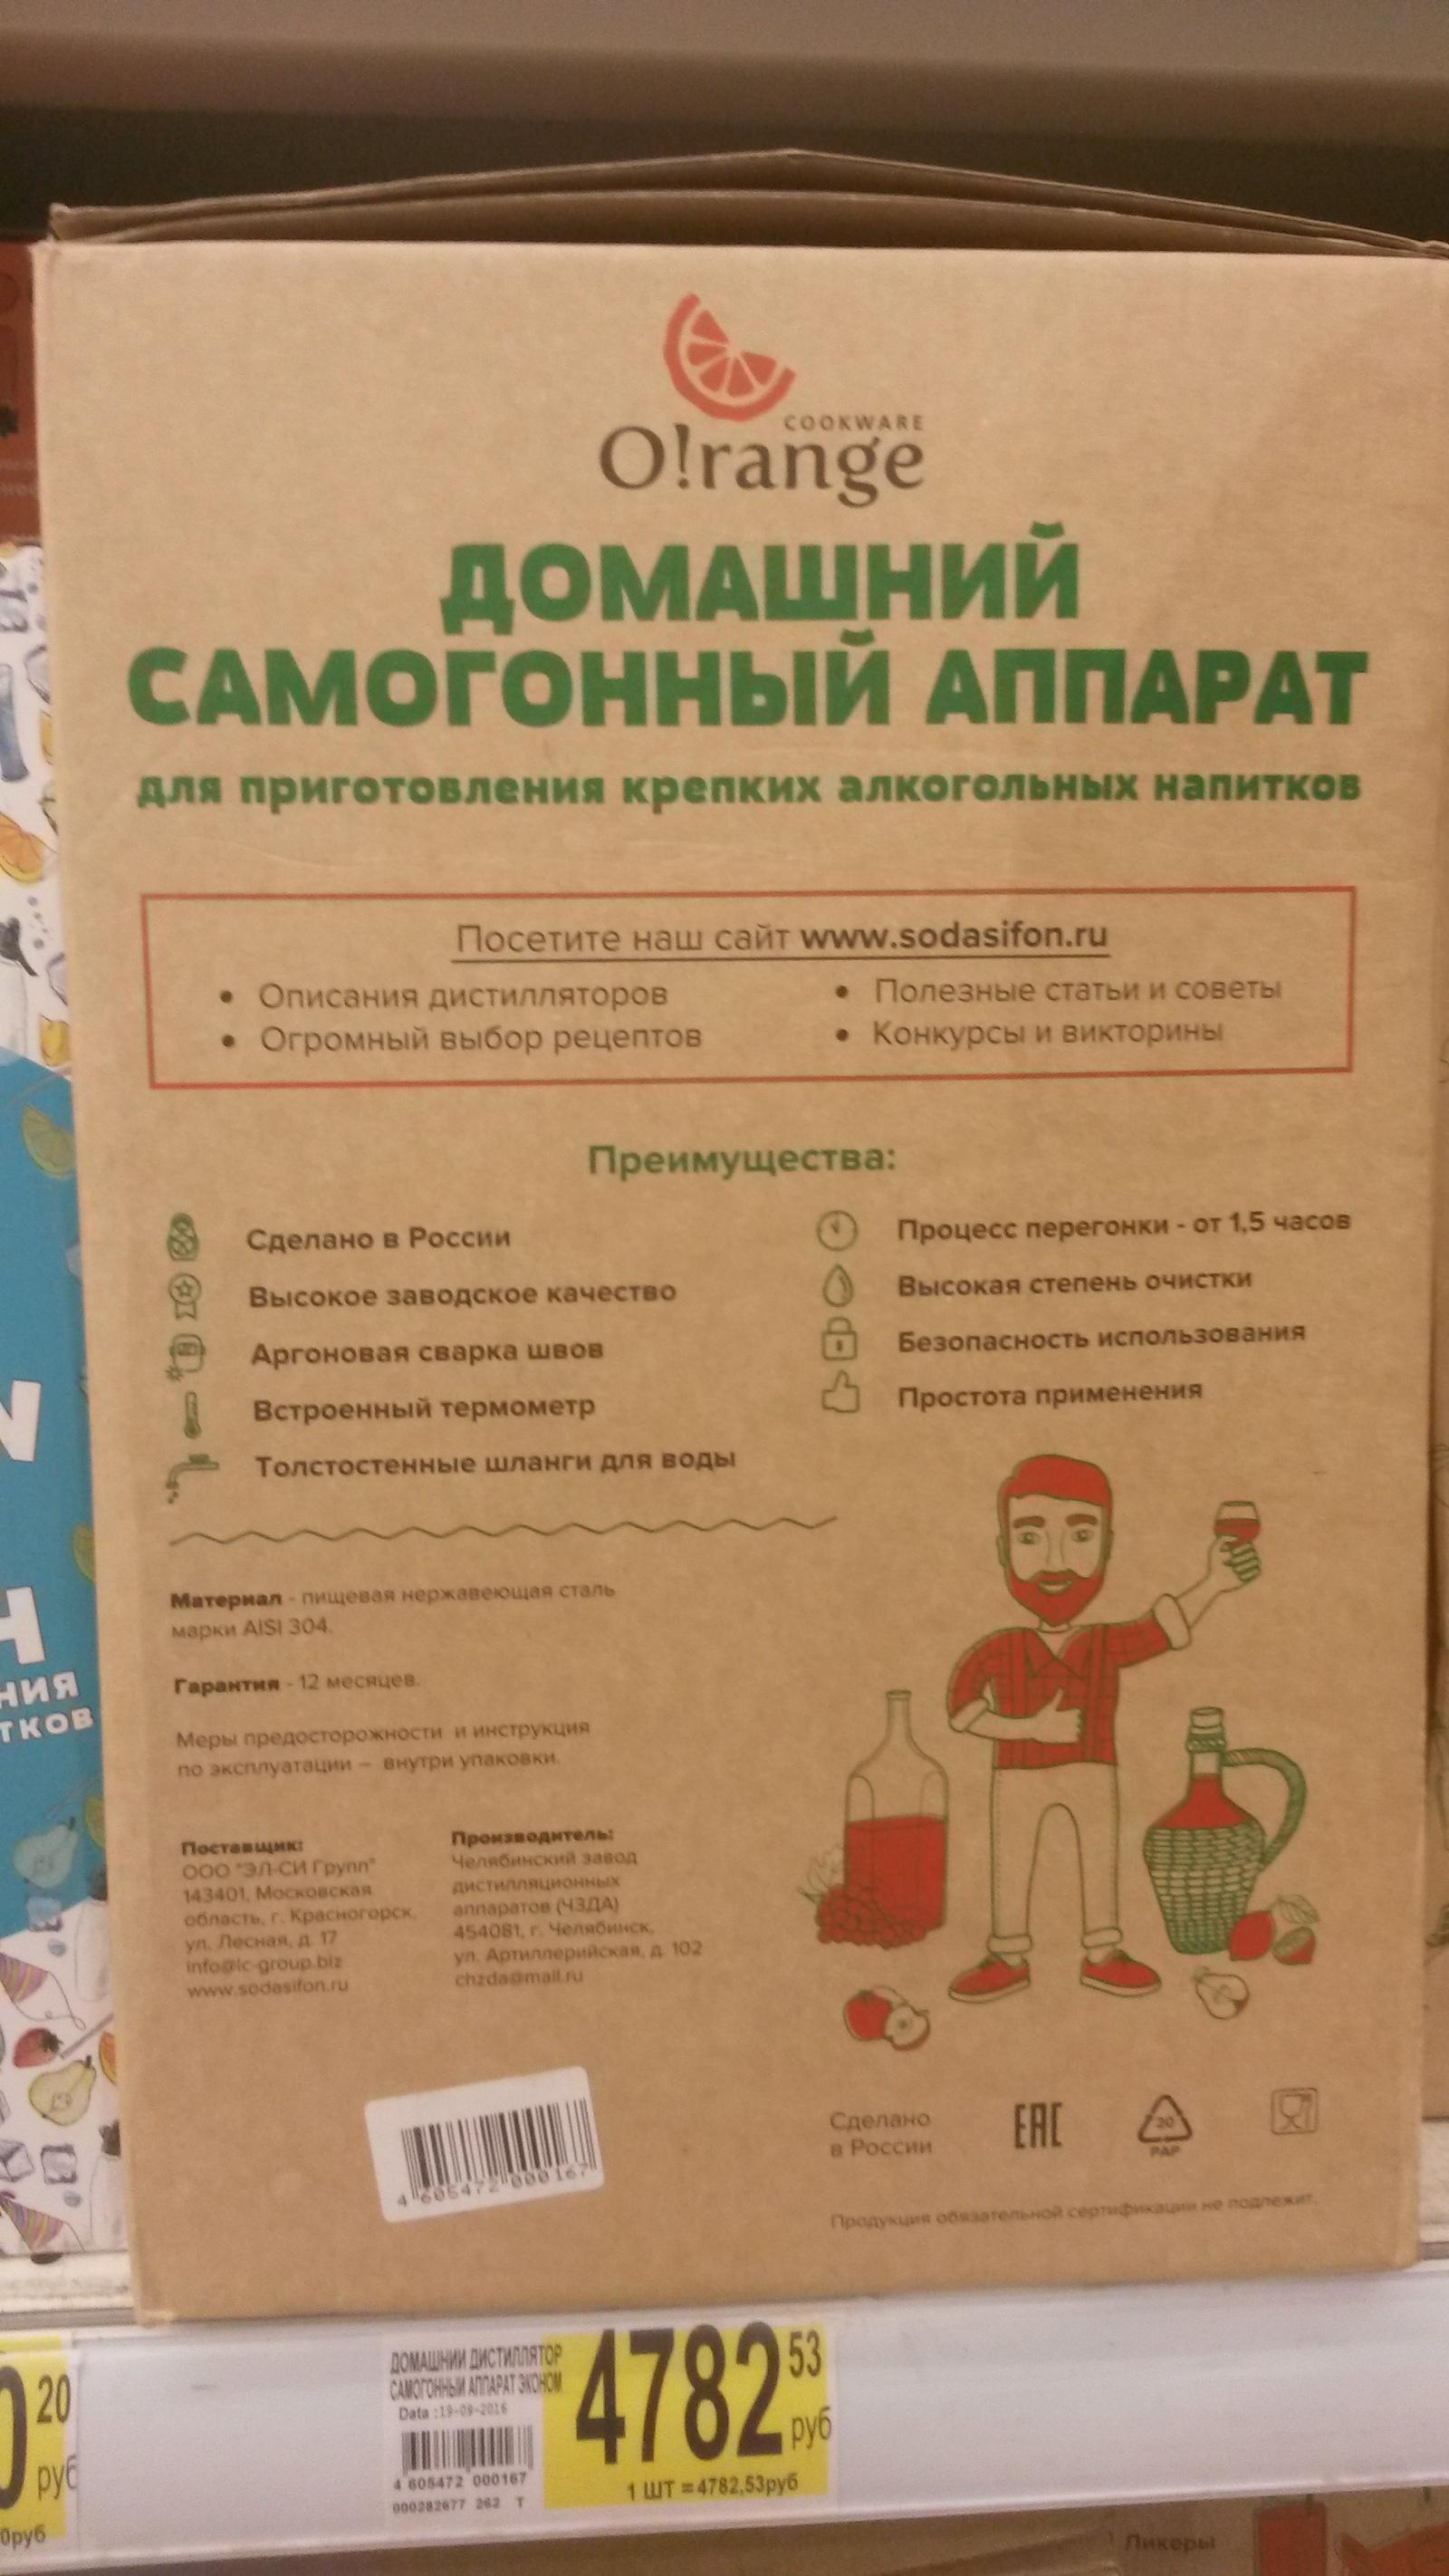 цена самогонного аппарата в москве